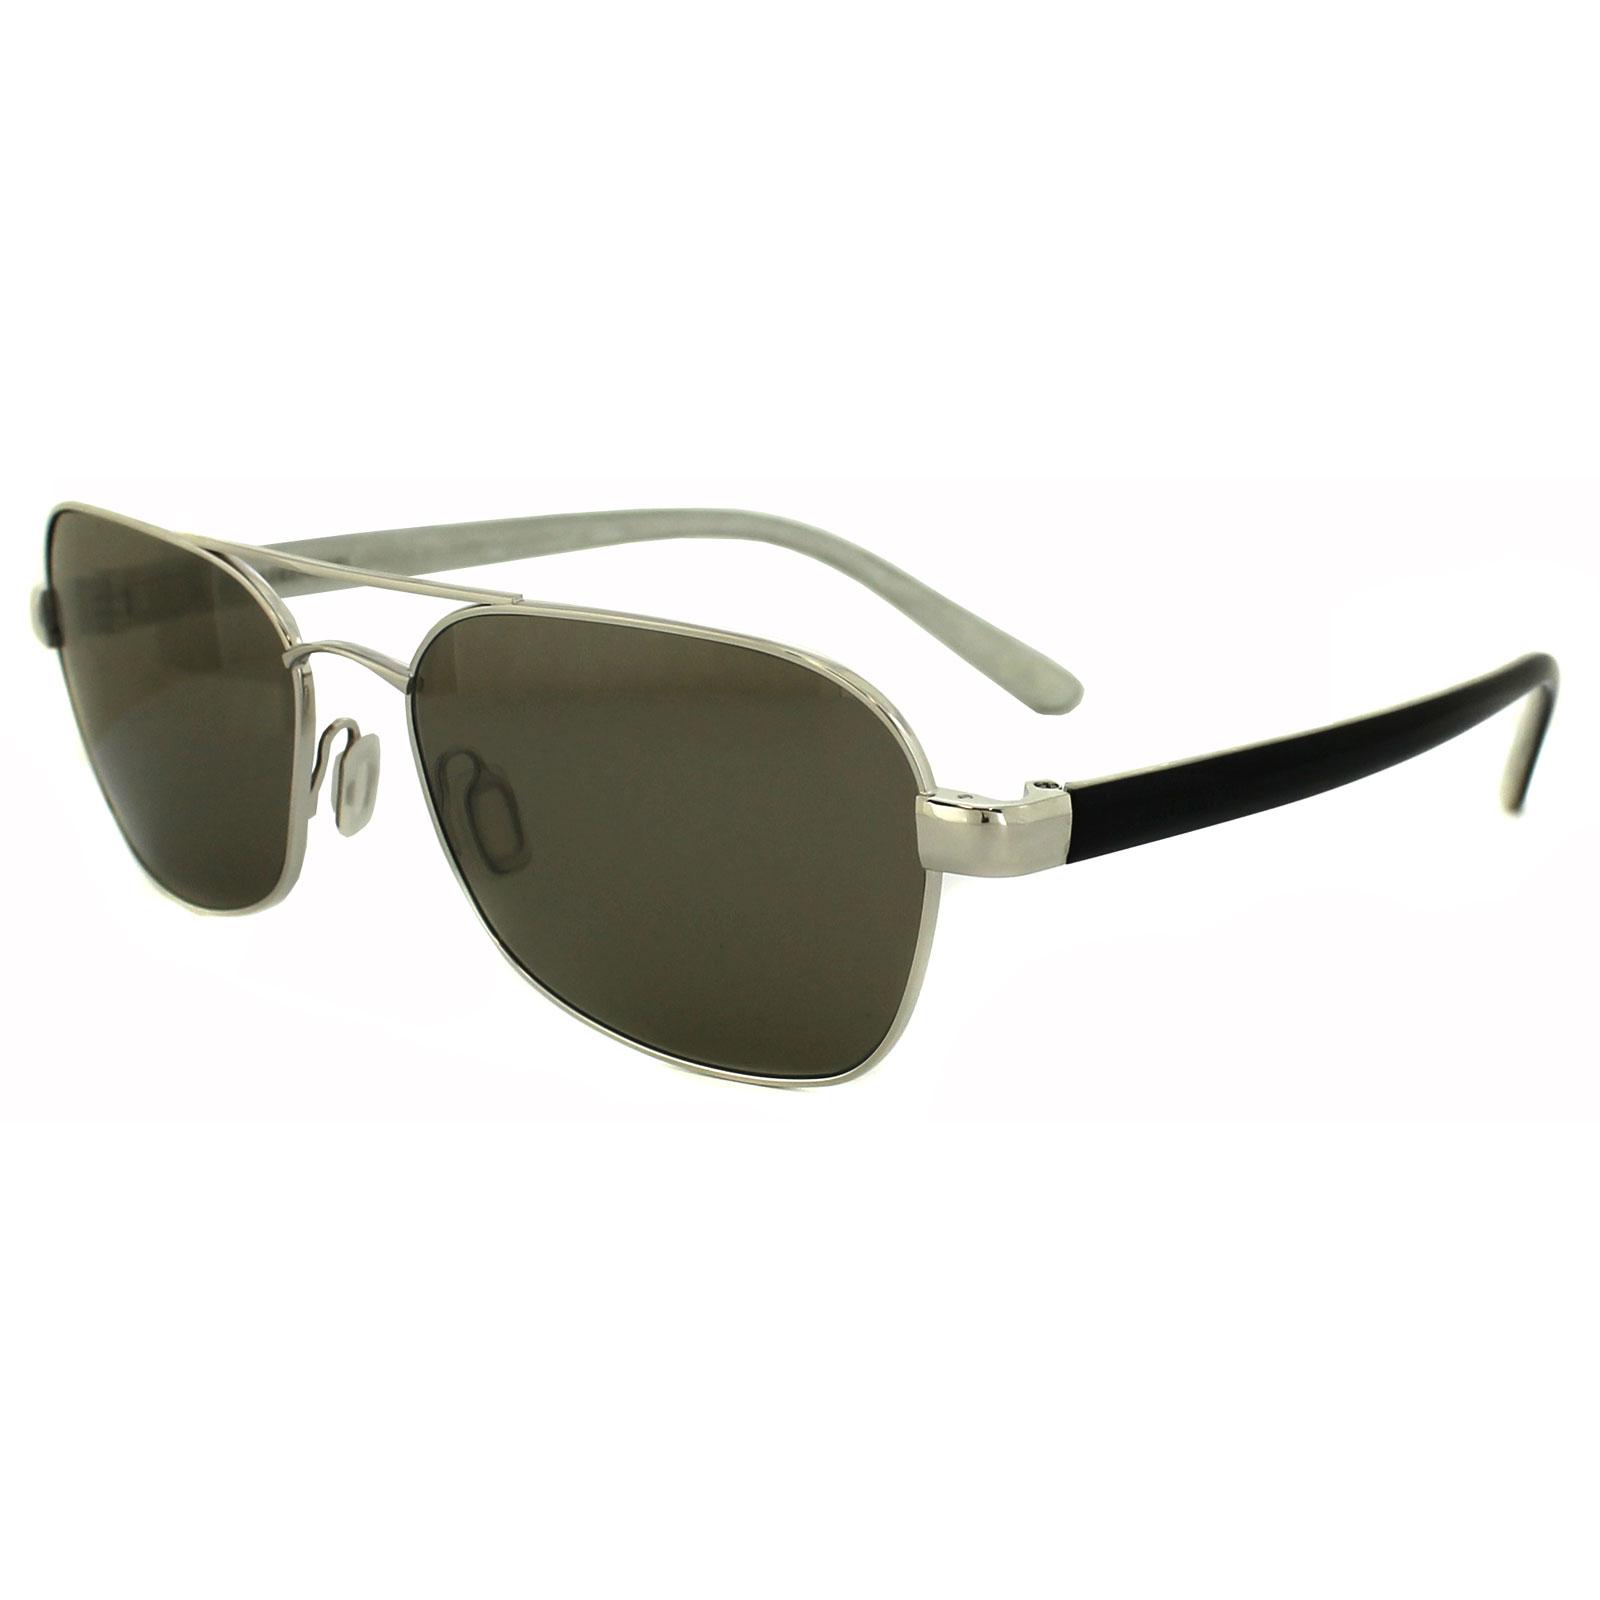 6ce7965dd10a9 Sentinel Serengeti Sunglasses Volterra 7596 Shiny Silver Grey Green 555nm